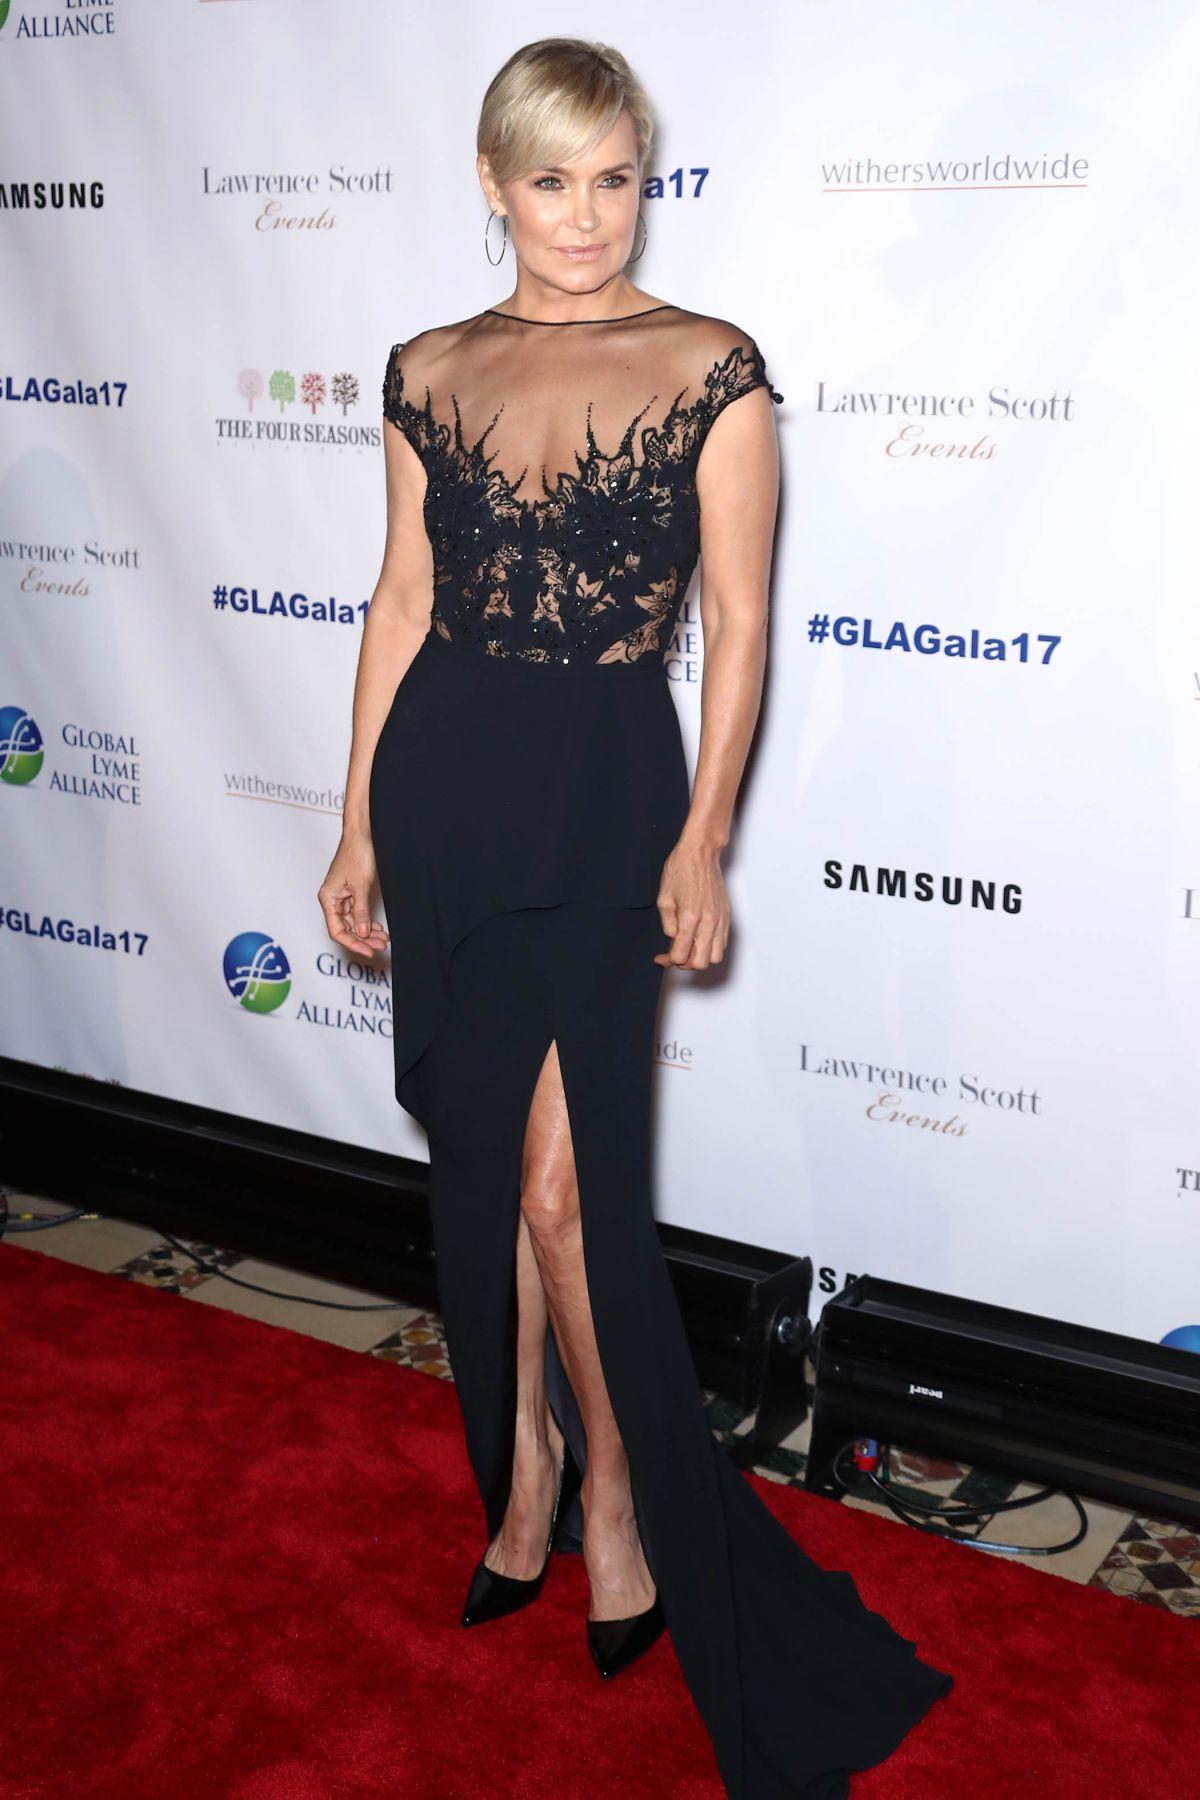 Yolanda Hadid attends the third annual Global Lyme Alliance Gala